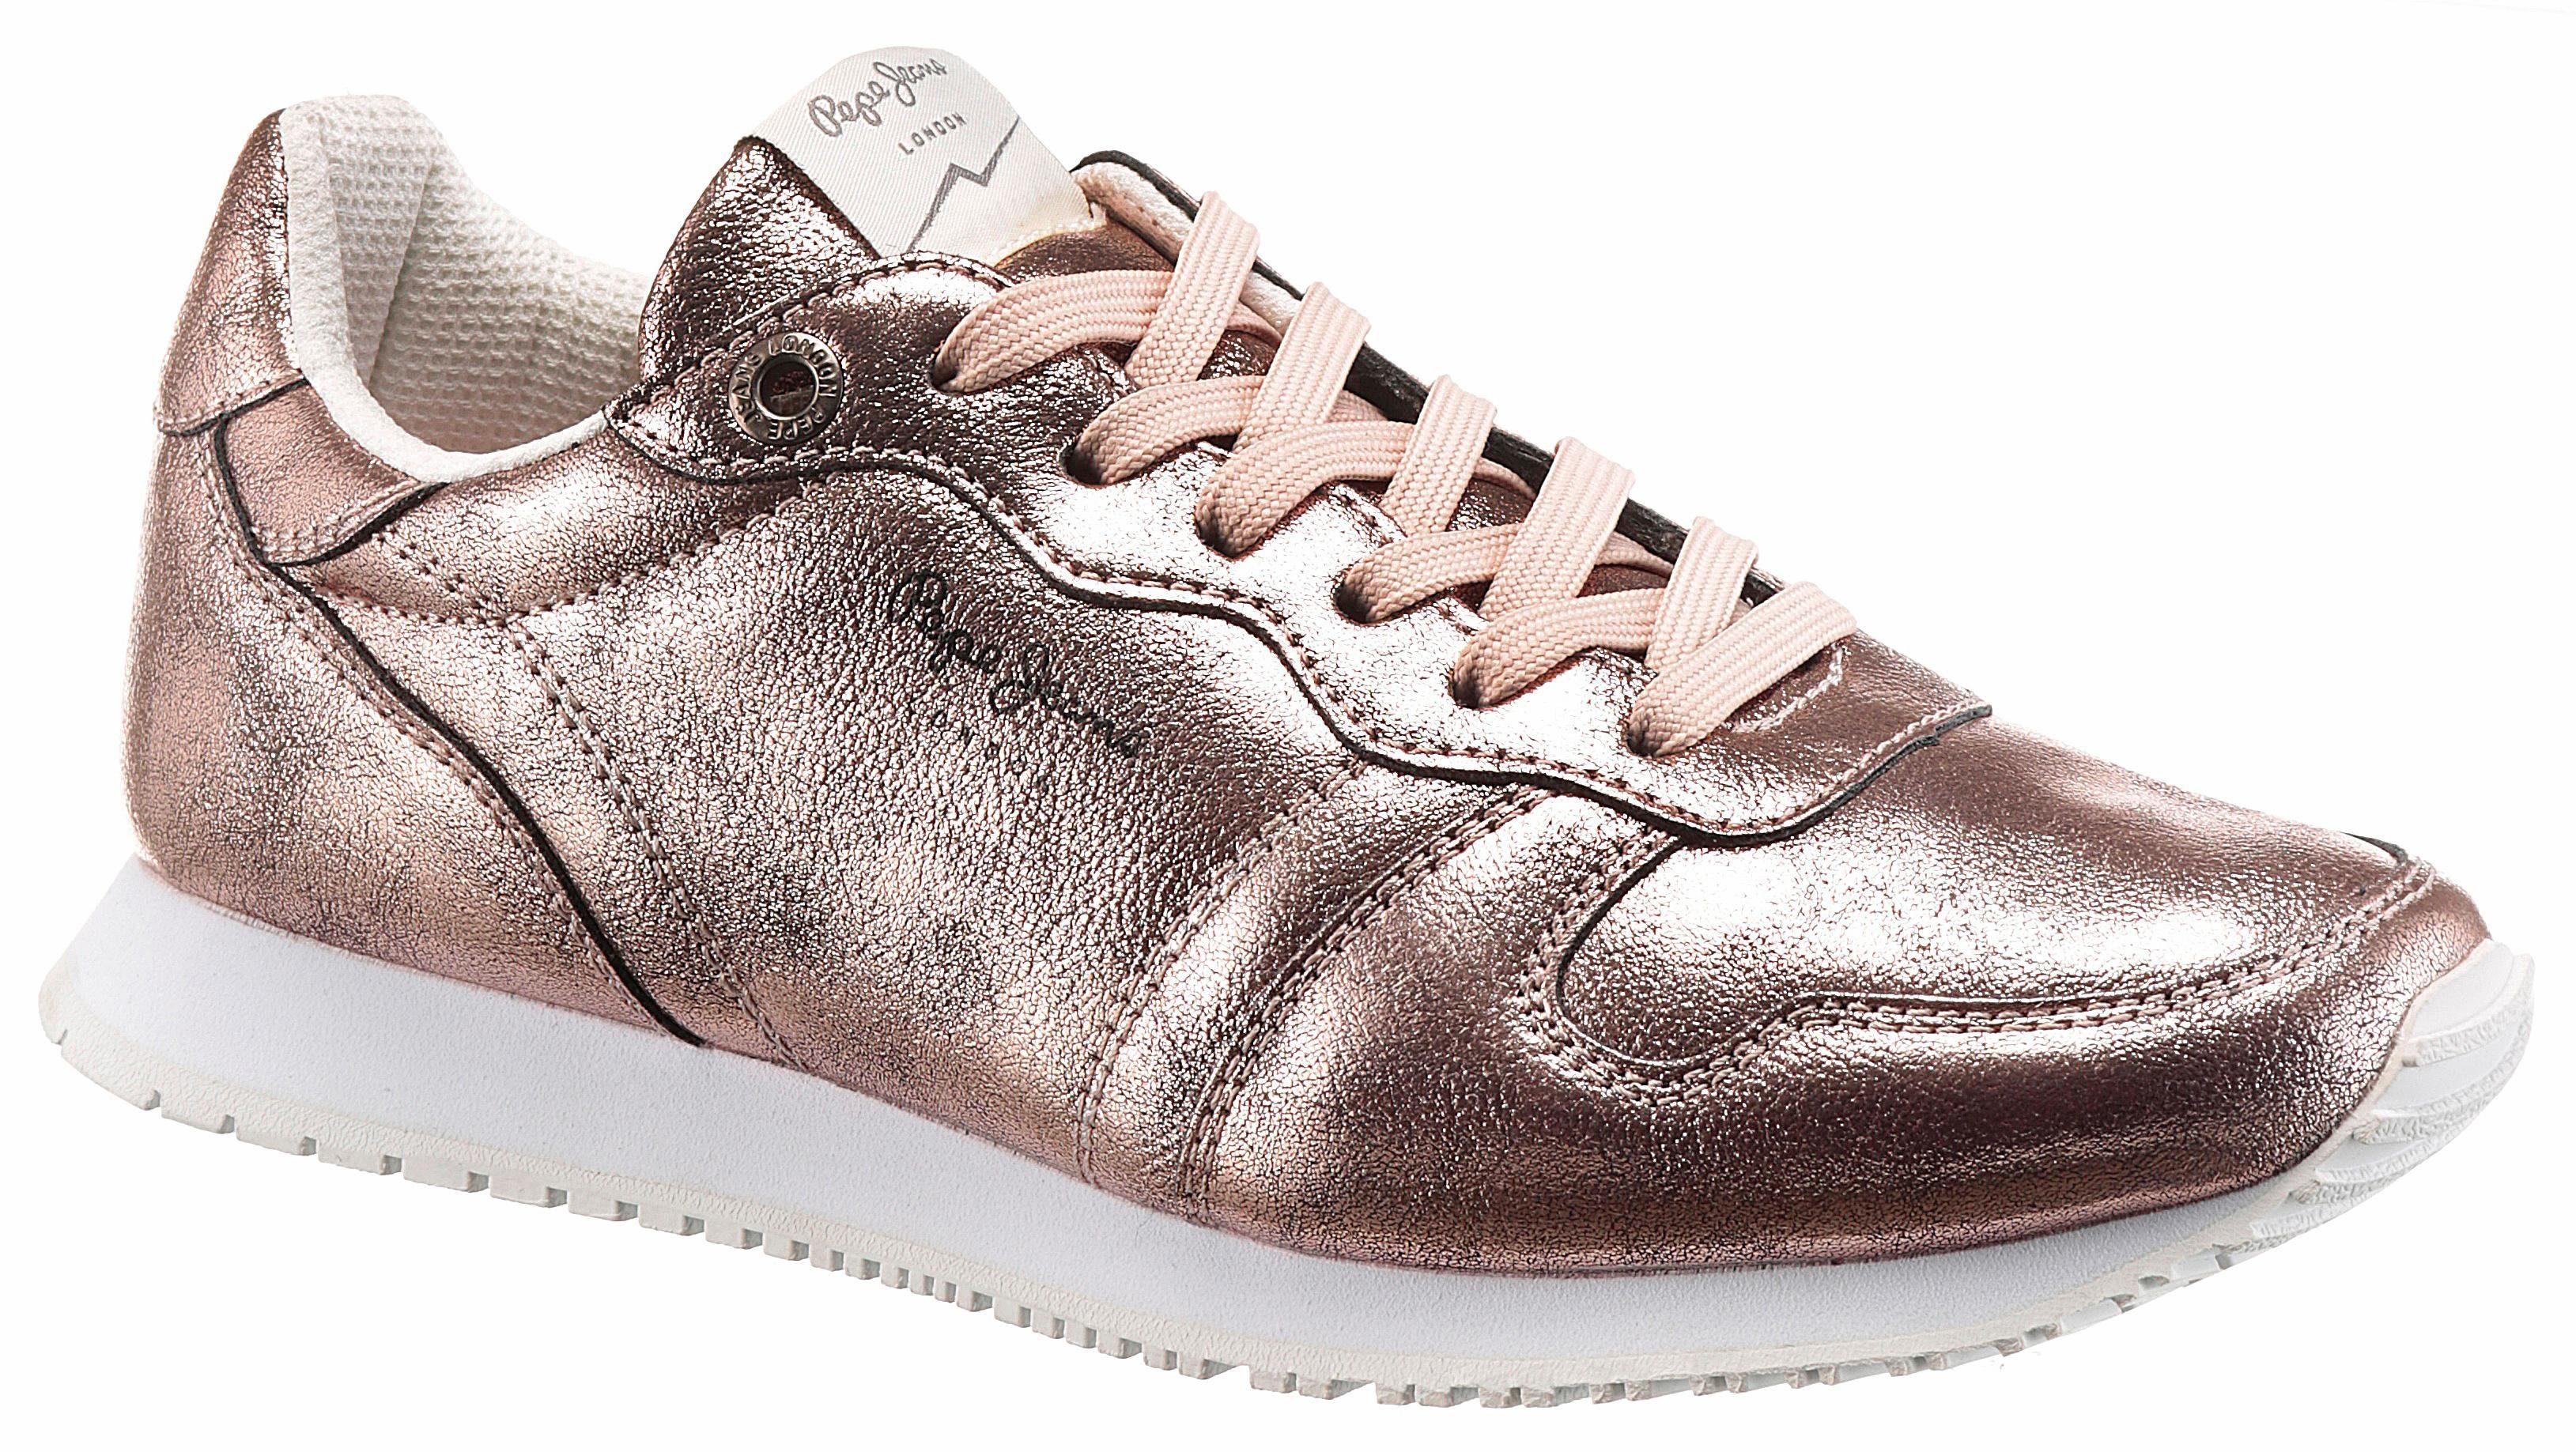 Pepe Jeans Gable Plain Sneaker, im trendigen Metallic-Look online kaufen  rosé